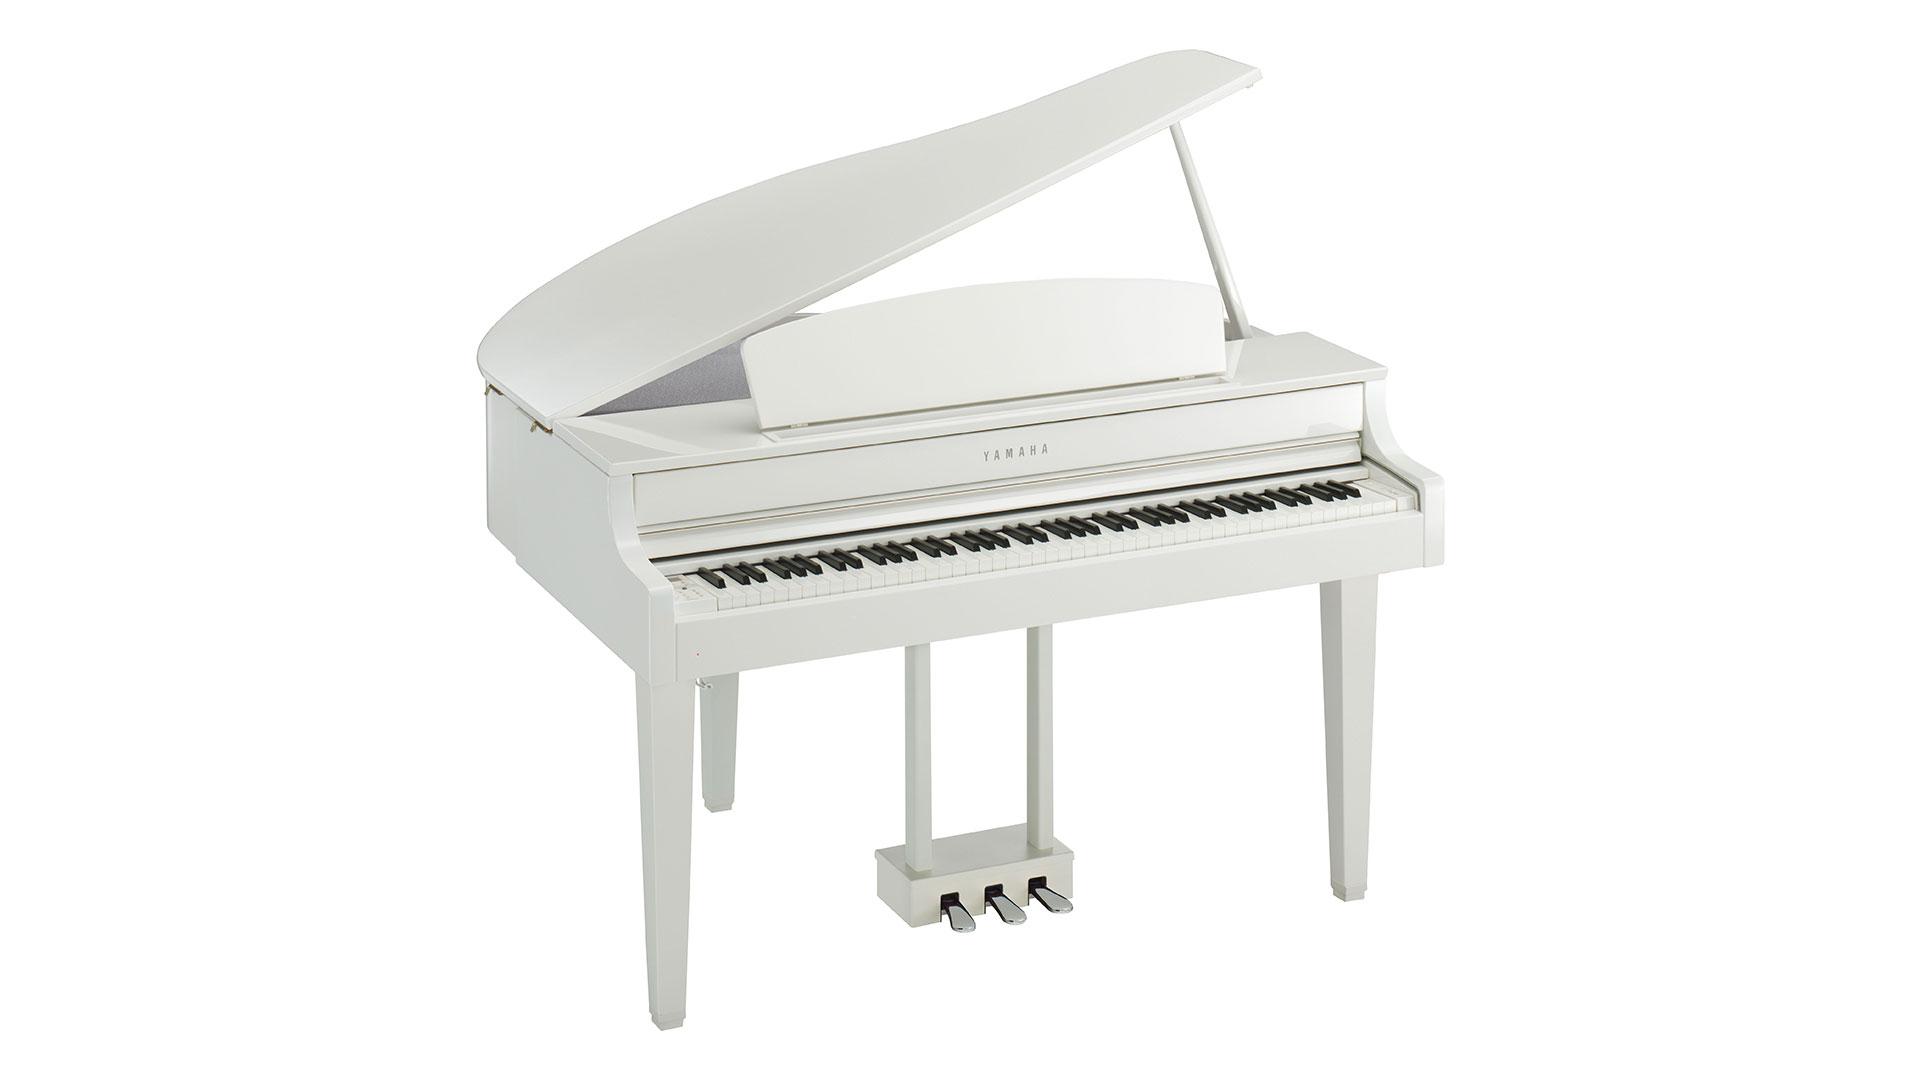 clp 665 gp yamaha clavinova digital grand piano buy online yamaha digital pianos. Black Bedroom Furniture Sets. Home Design Ideas